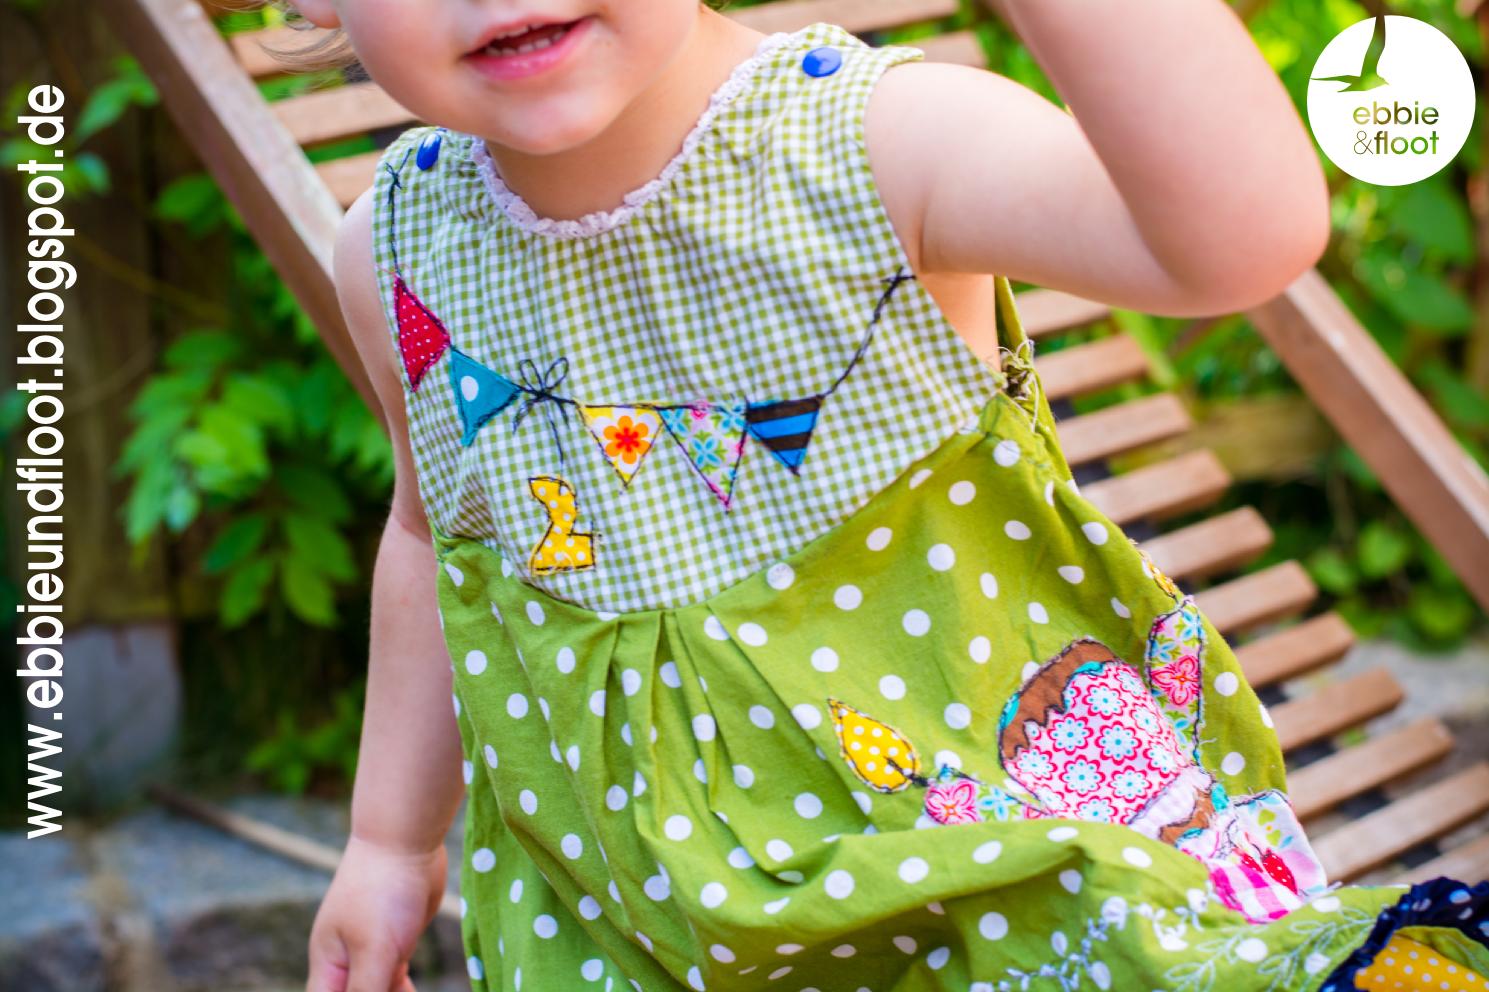 ebbie und floot_farbenmix_Cara_Kleid_Dress_birthday dress_Cake_Ballon_ribbons_ruffels_green_dots_04